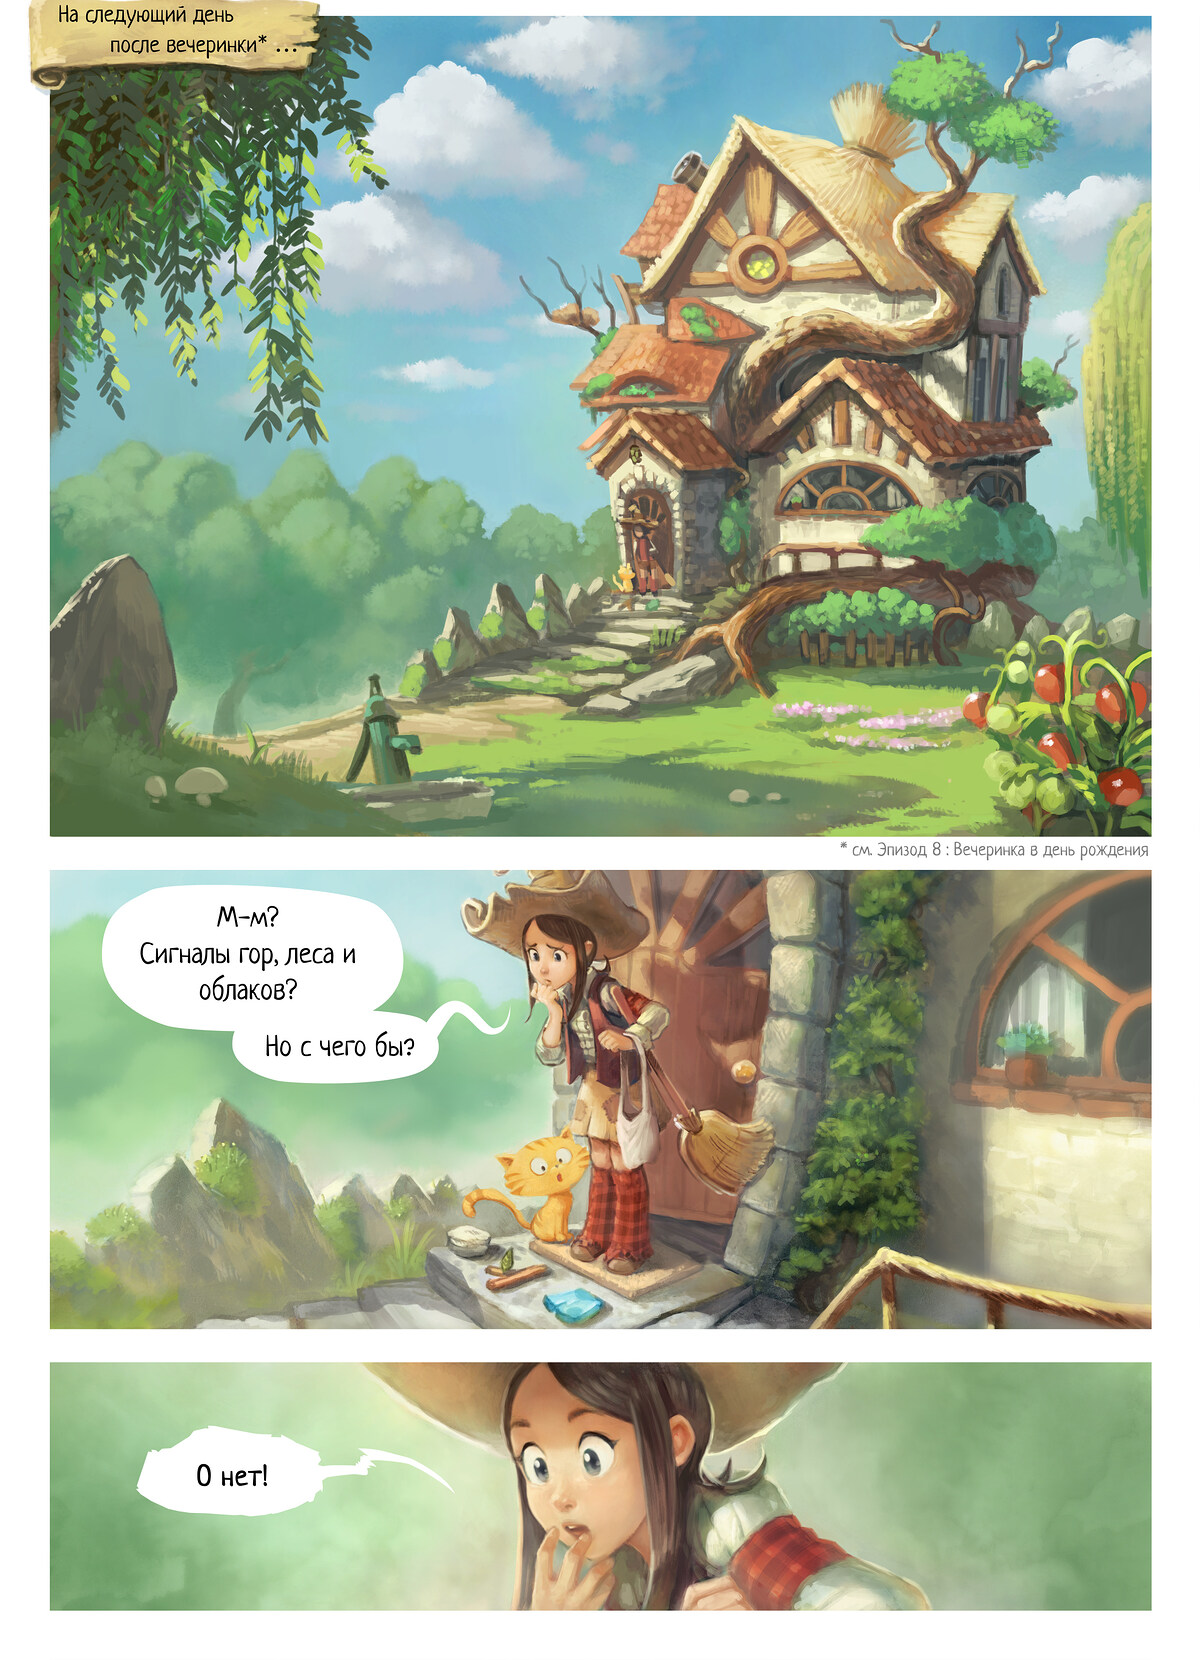 A webcomic page of Pepper&Carrot, эпизод 9 [ru], стр. 1